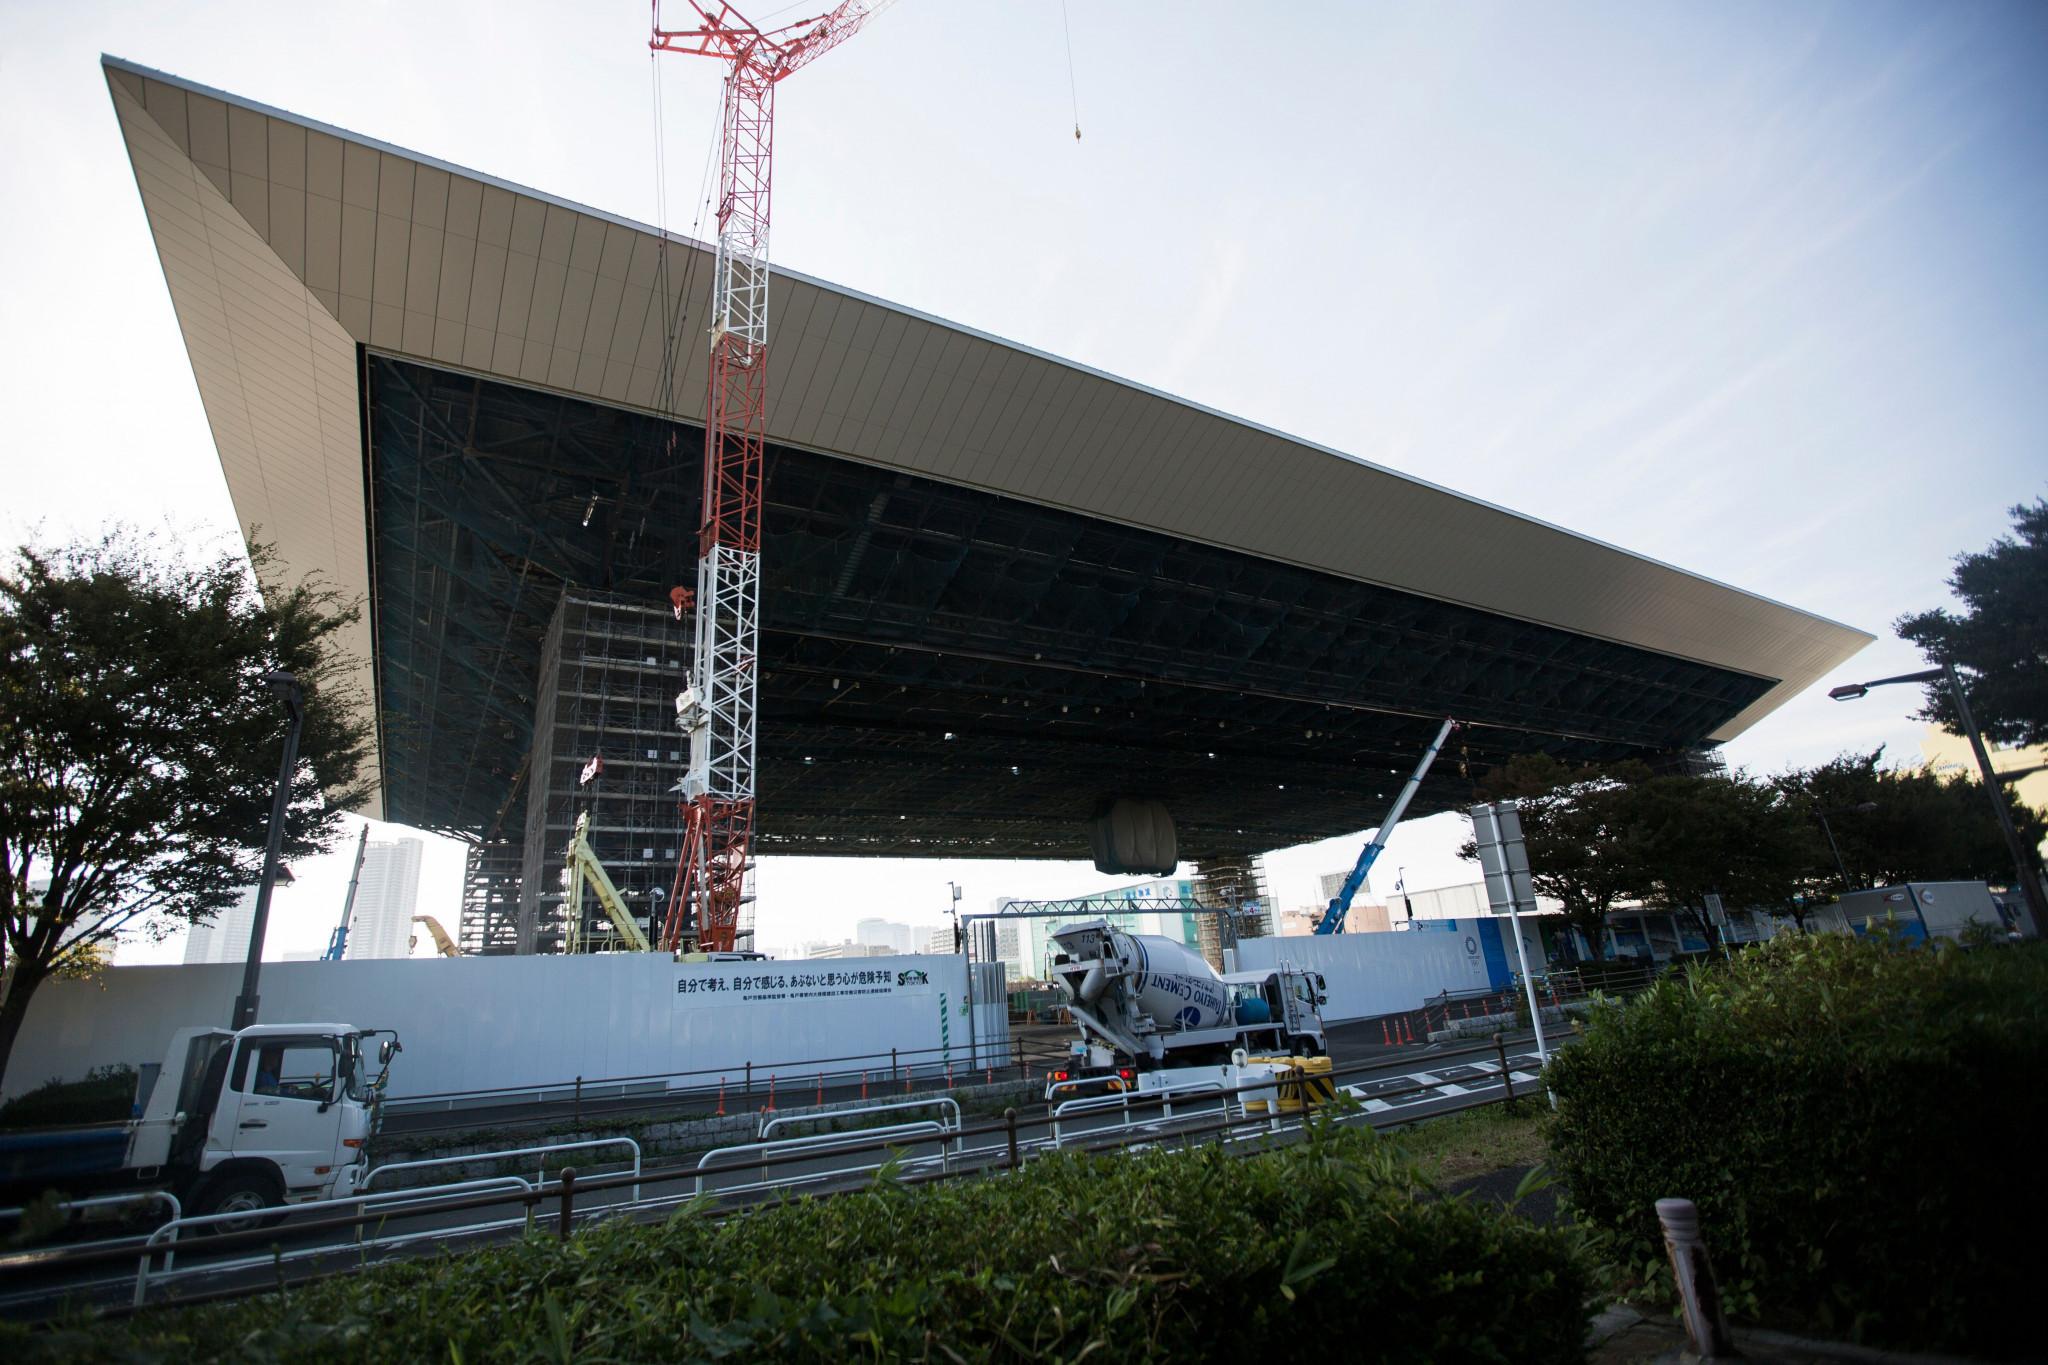 Tokyo 2020 aquatics and tennis venues hit difficulties, report claims